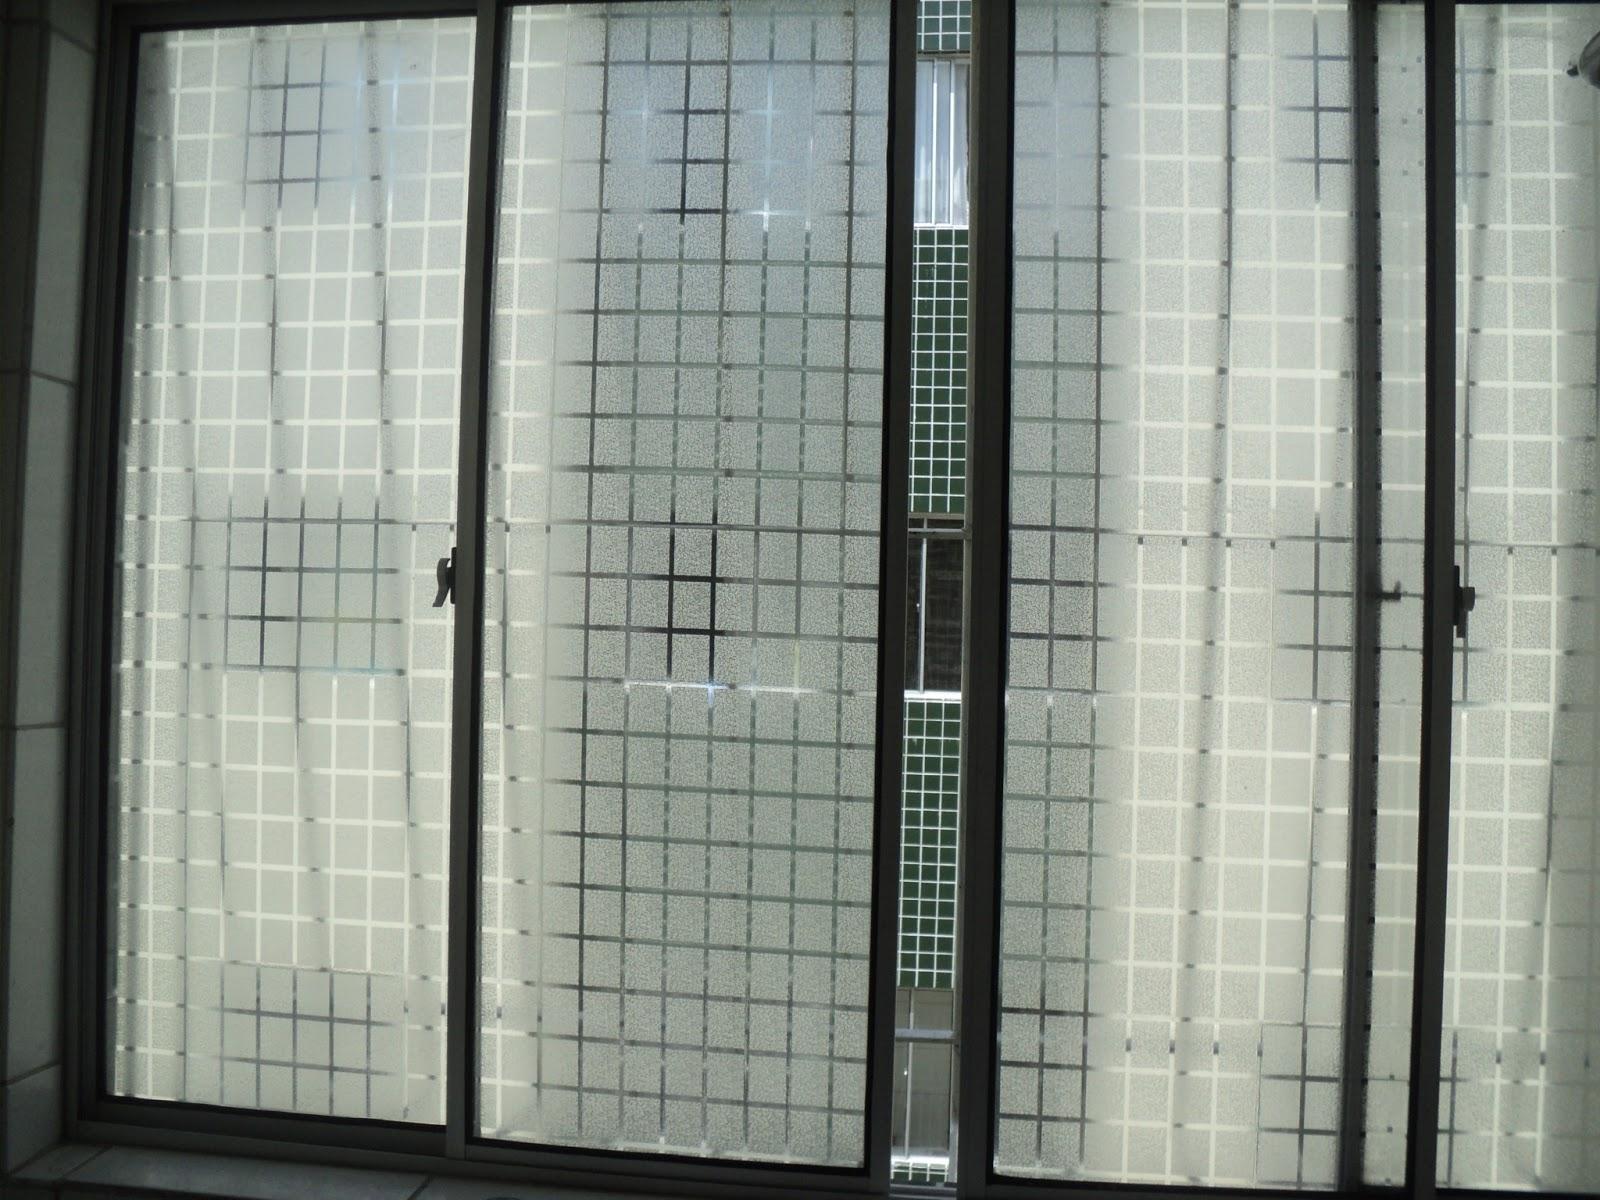 #5A6B71 Adesivo jateado semi transparente quadriculado. Efeito de vidro fosco. 164 Janelas De Vidro Letra